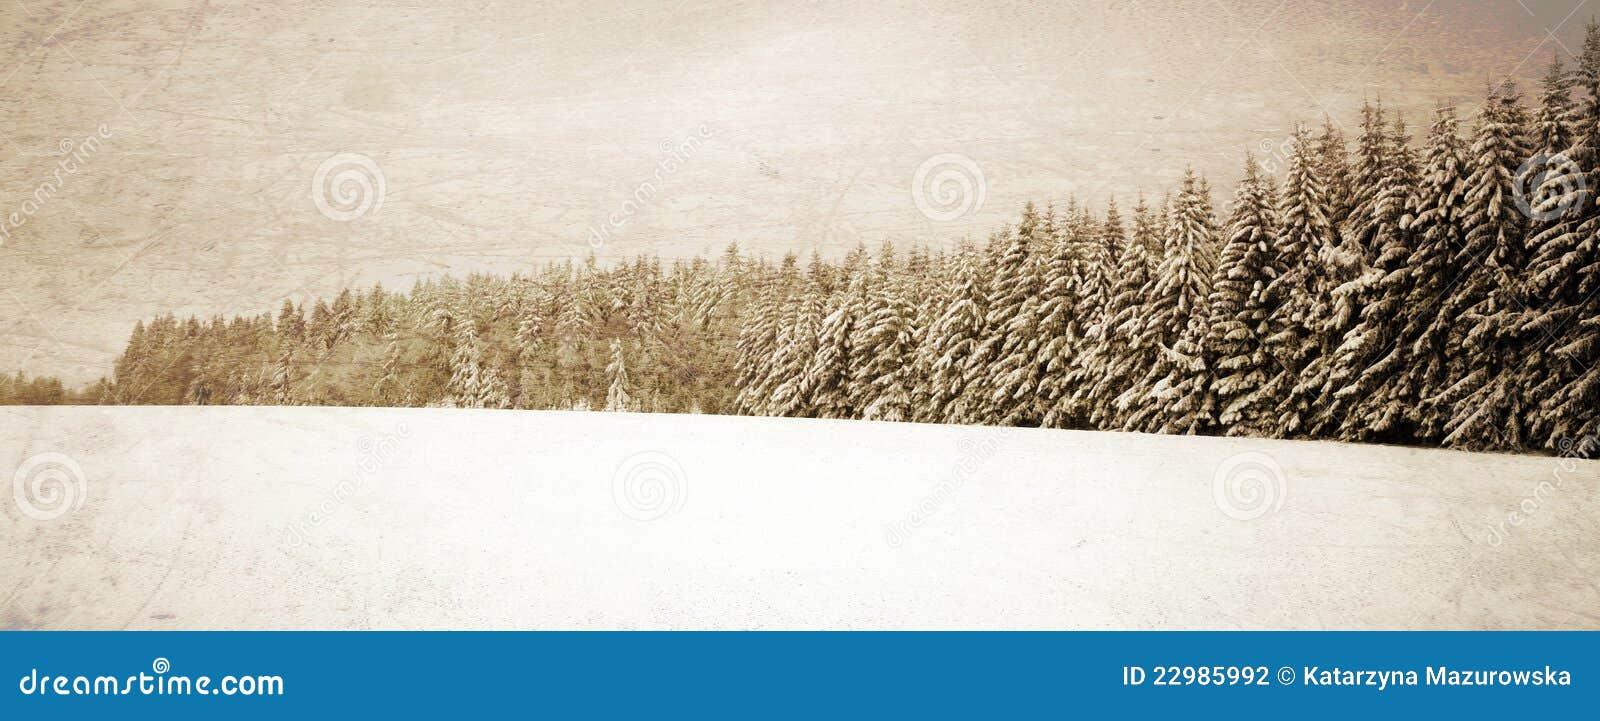 Winter Vintage Landscape Stock Photography - Image: 22985992